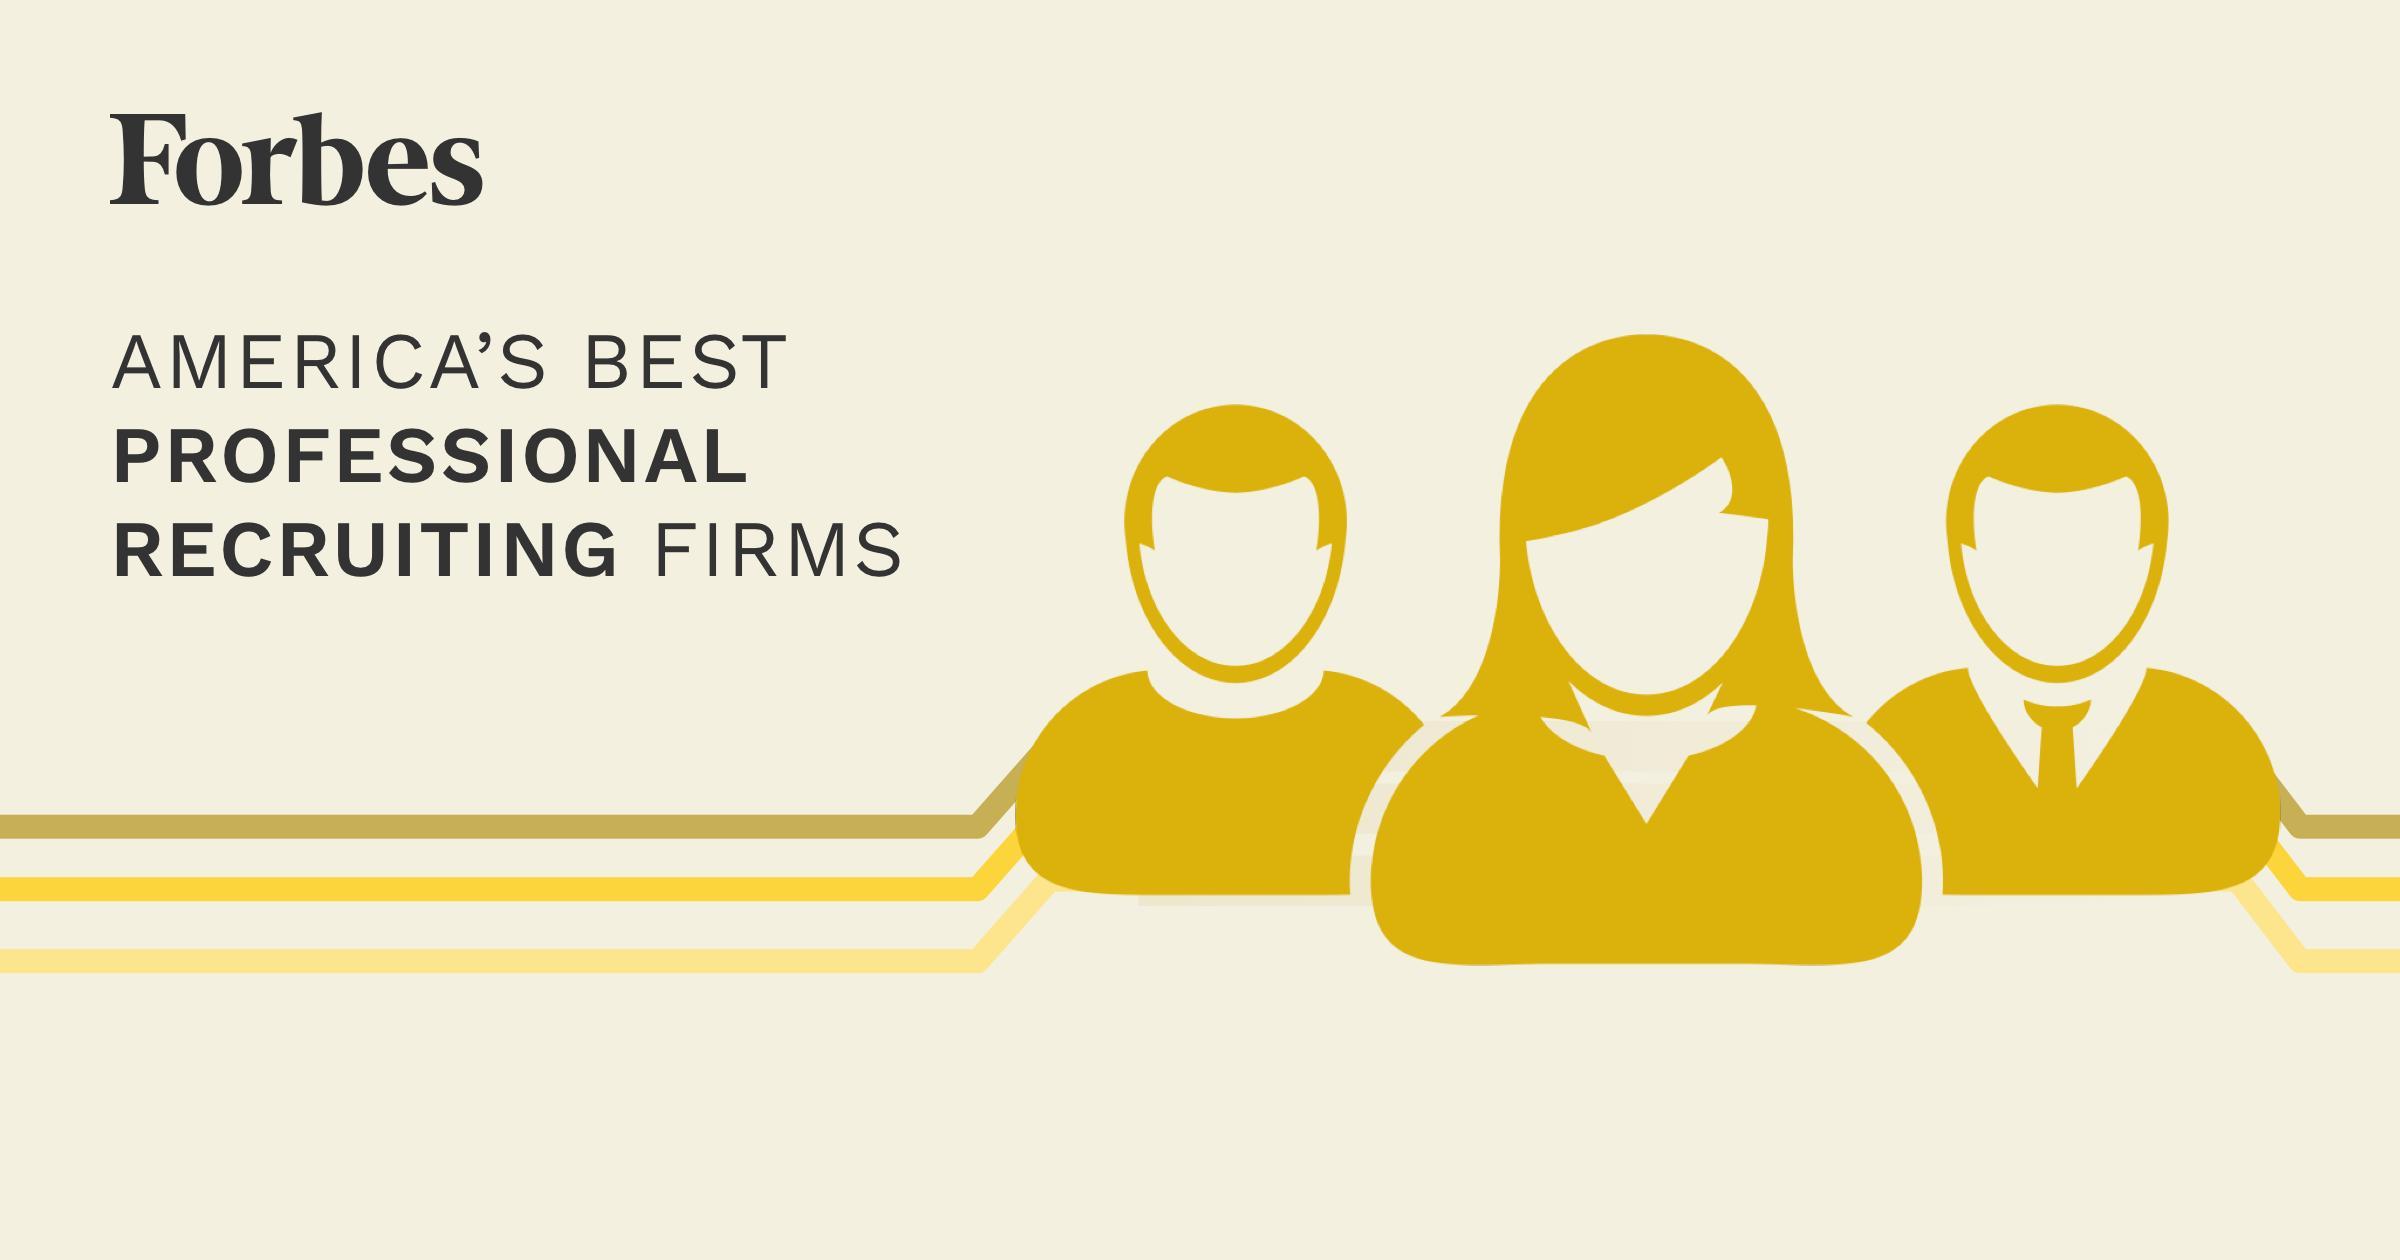 America's Best Professional Recruiting Firms